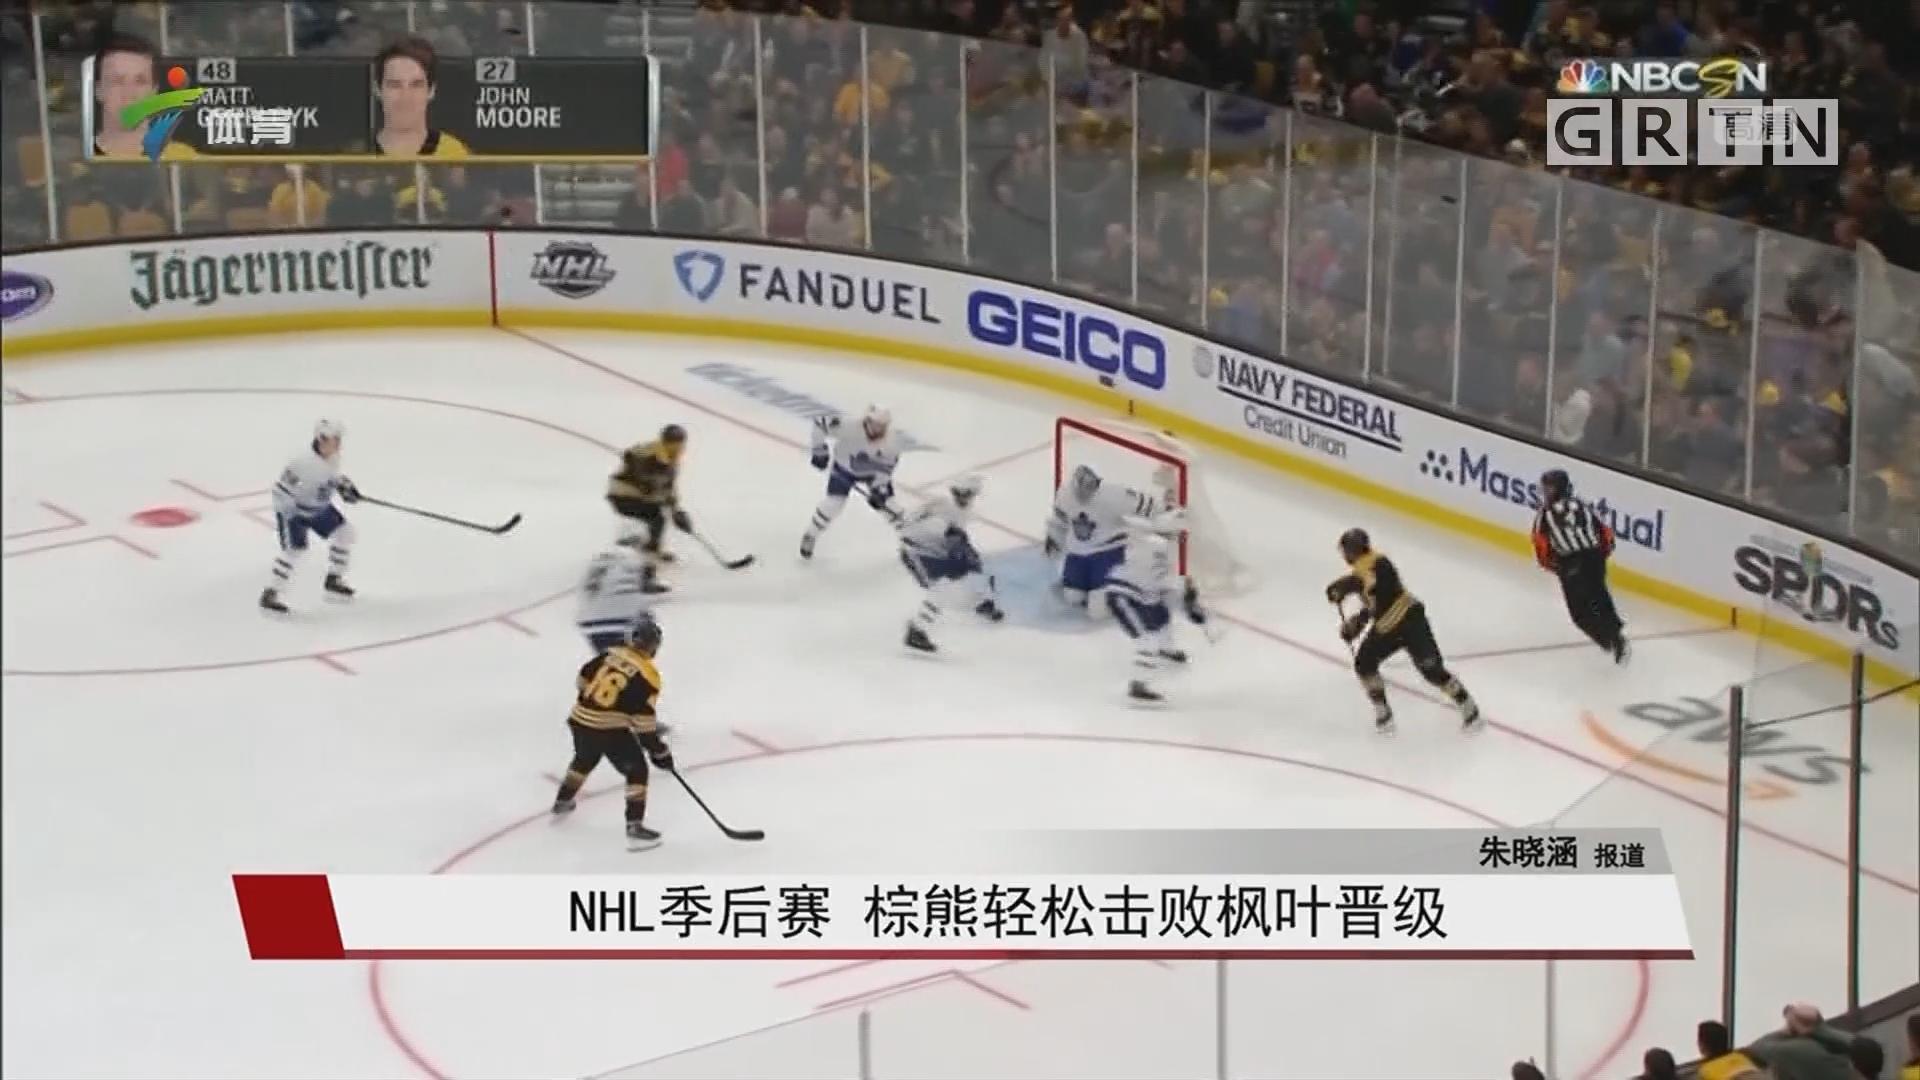 NHL季后赛 棕熊轻松击败枫叶晋级